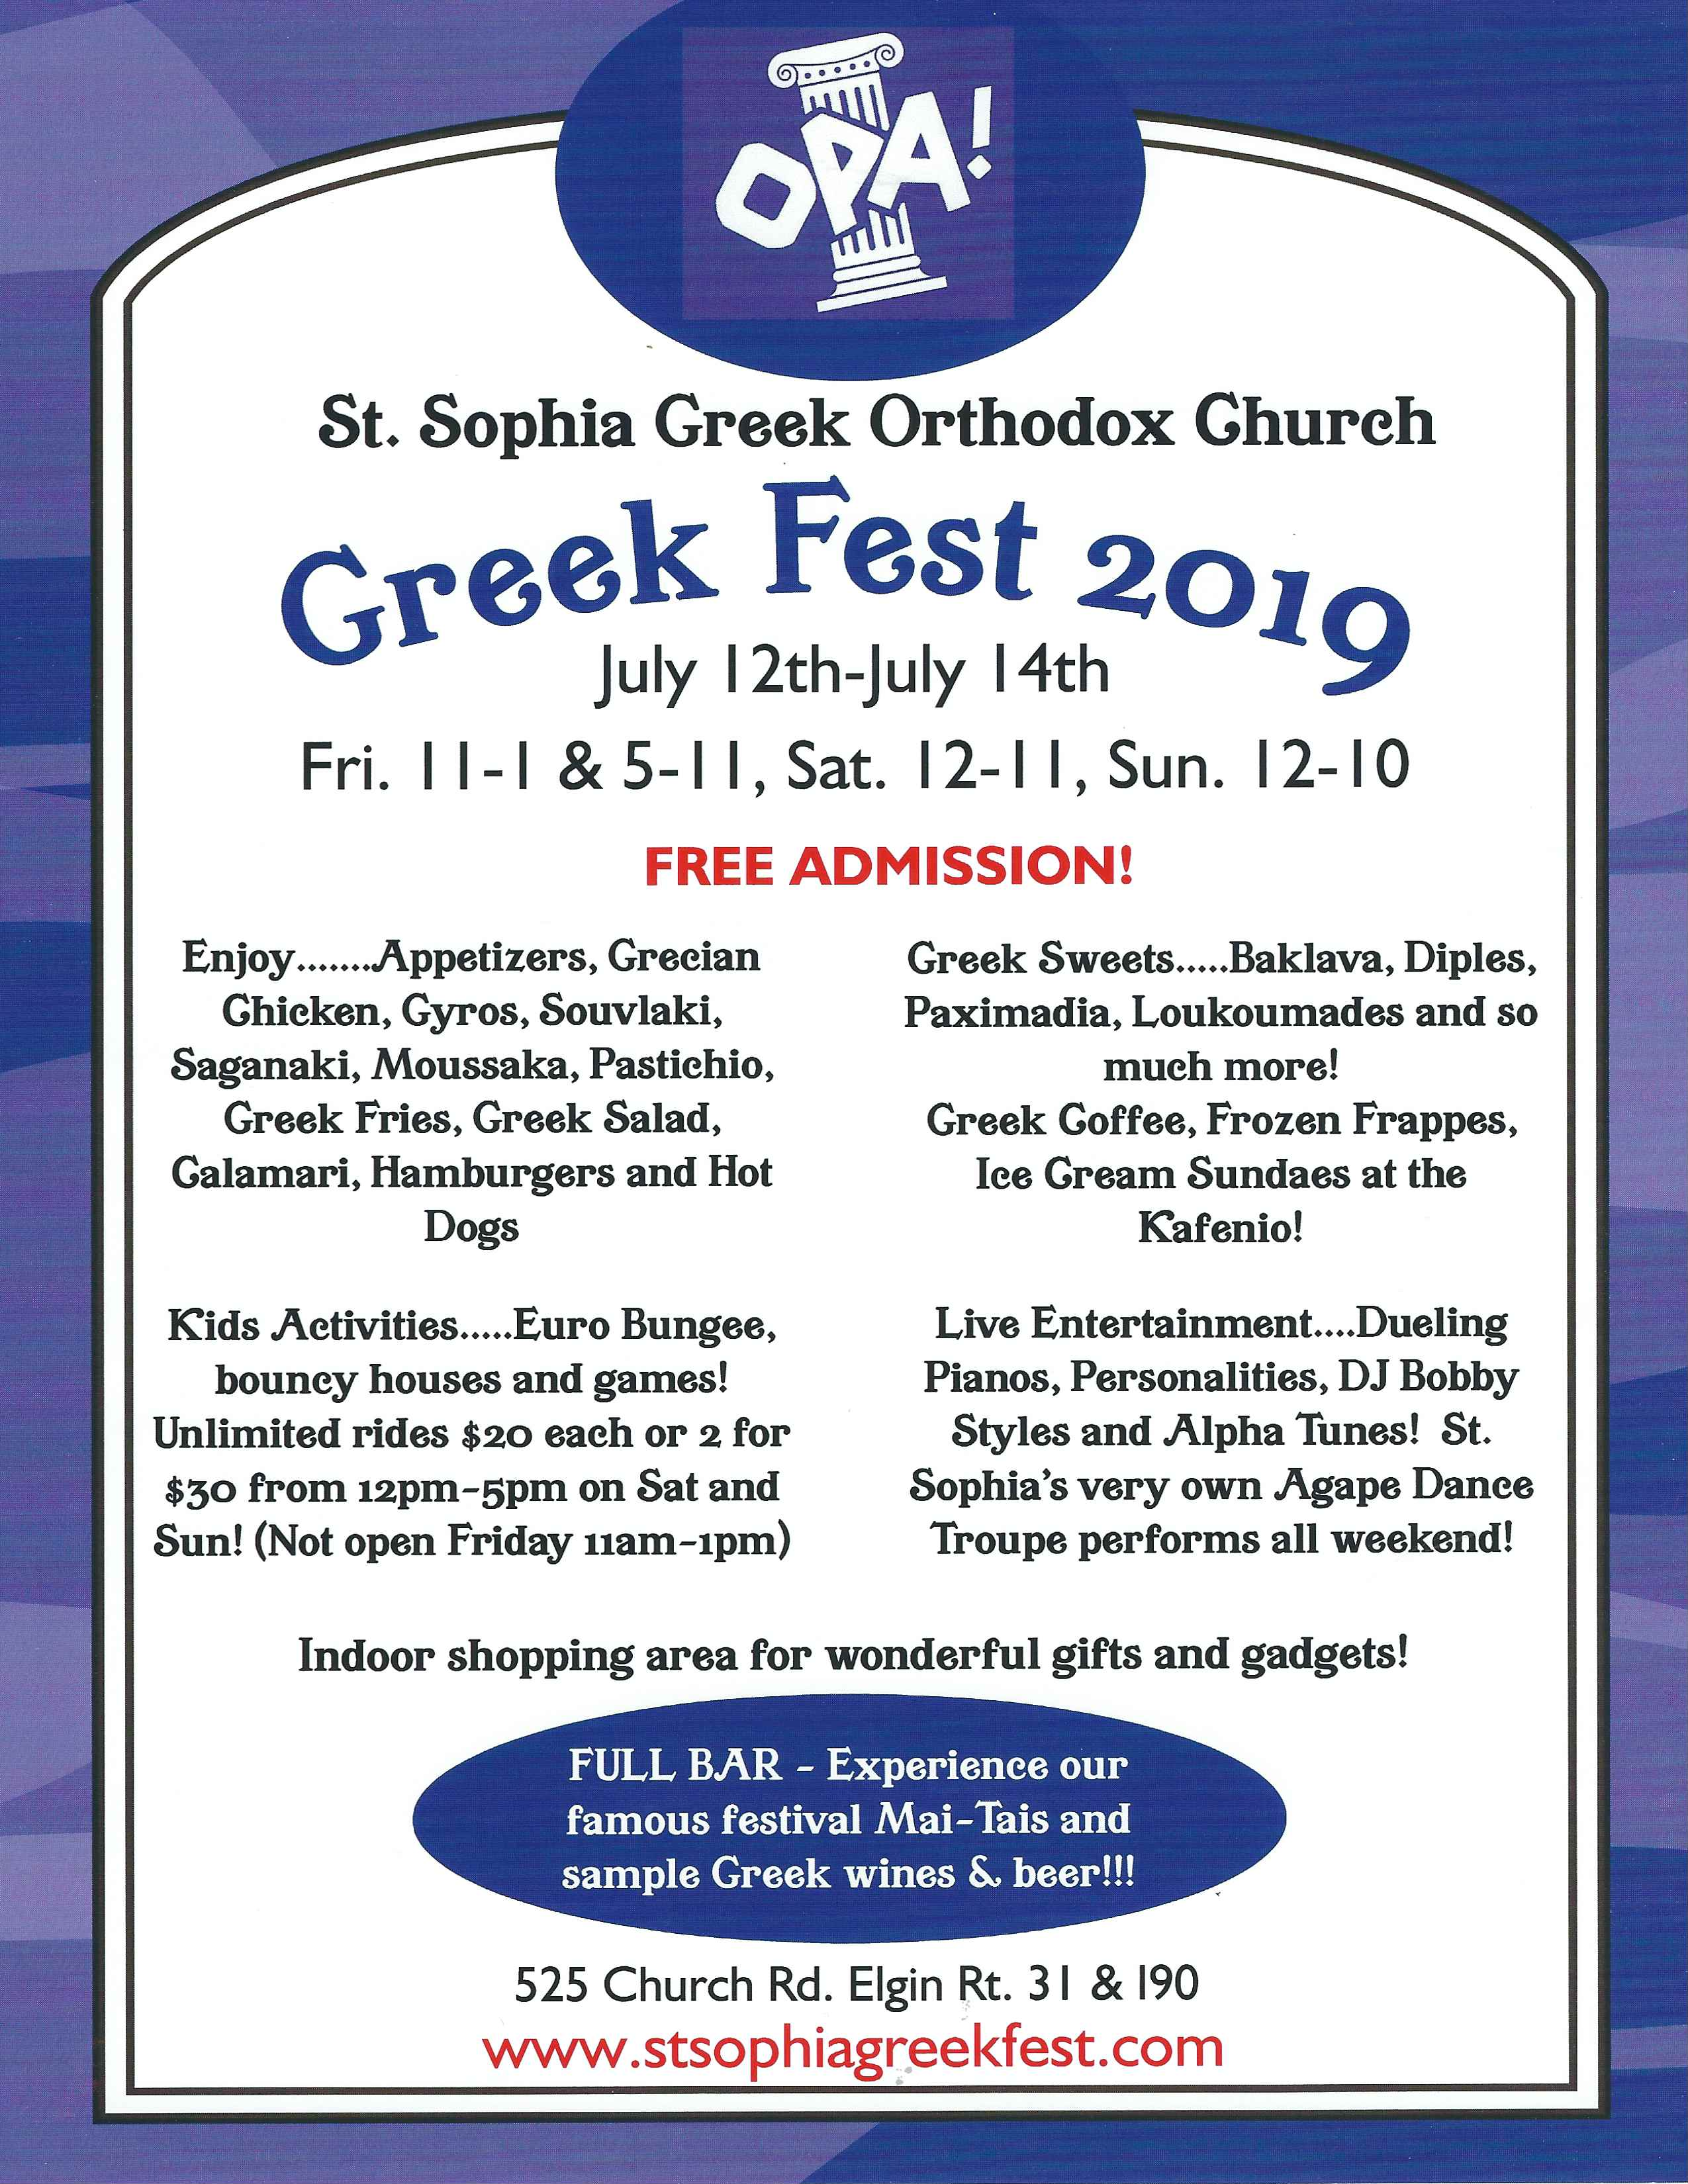 Greek Fest at St  Sophia Greek Orthodox Church July 12 - 14 - Elgin